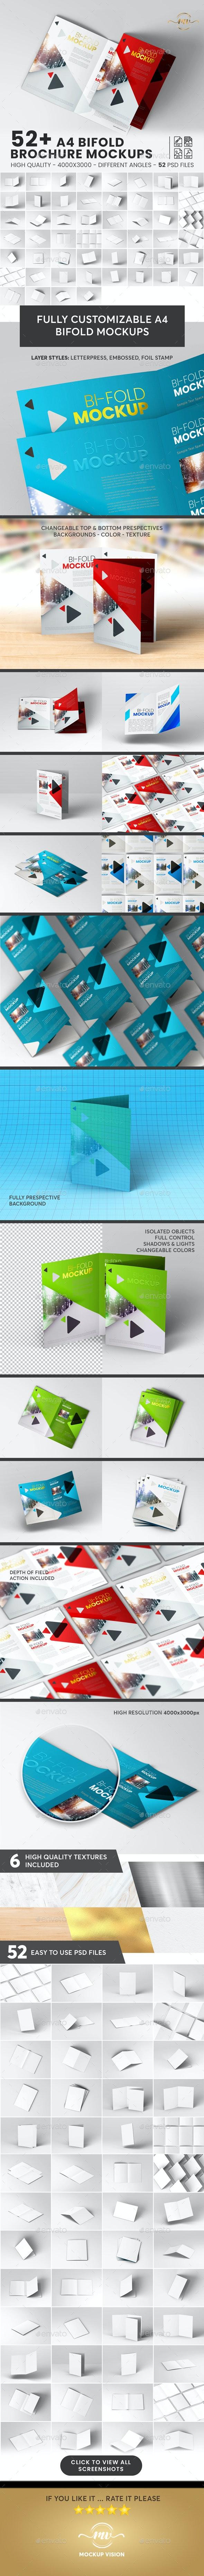 52+ A4 Bifold, Brochure Mockup Bundle - Brochures Print